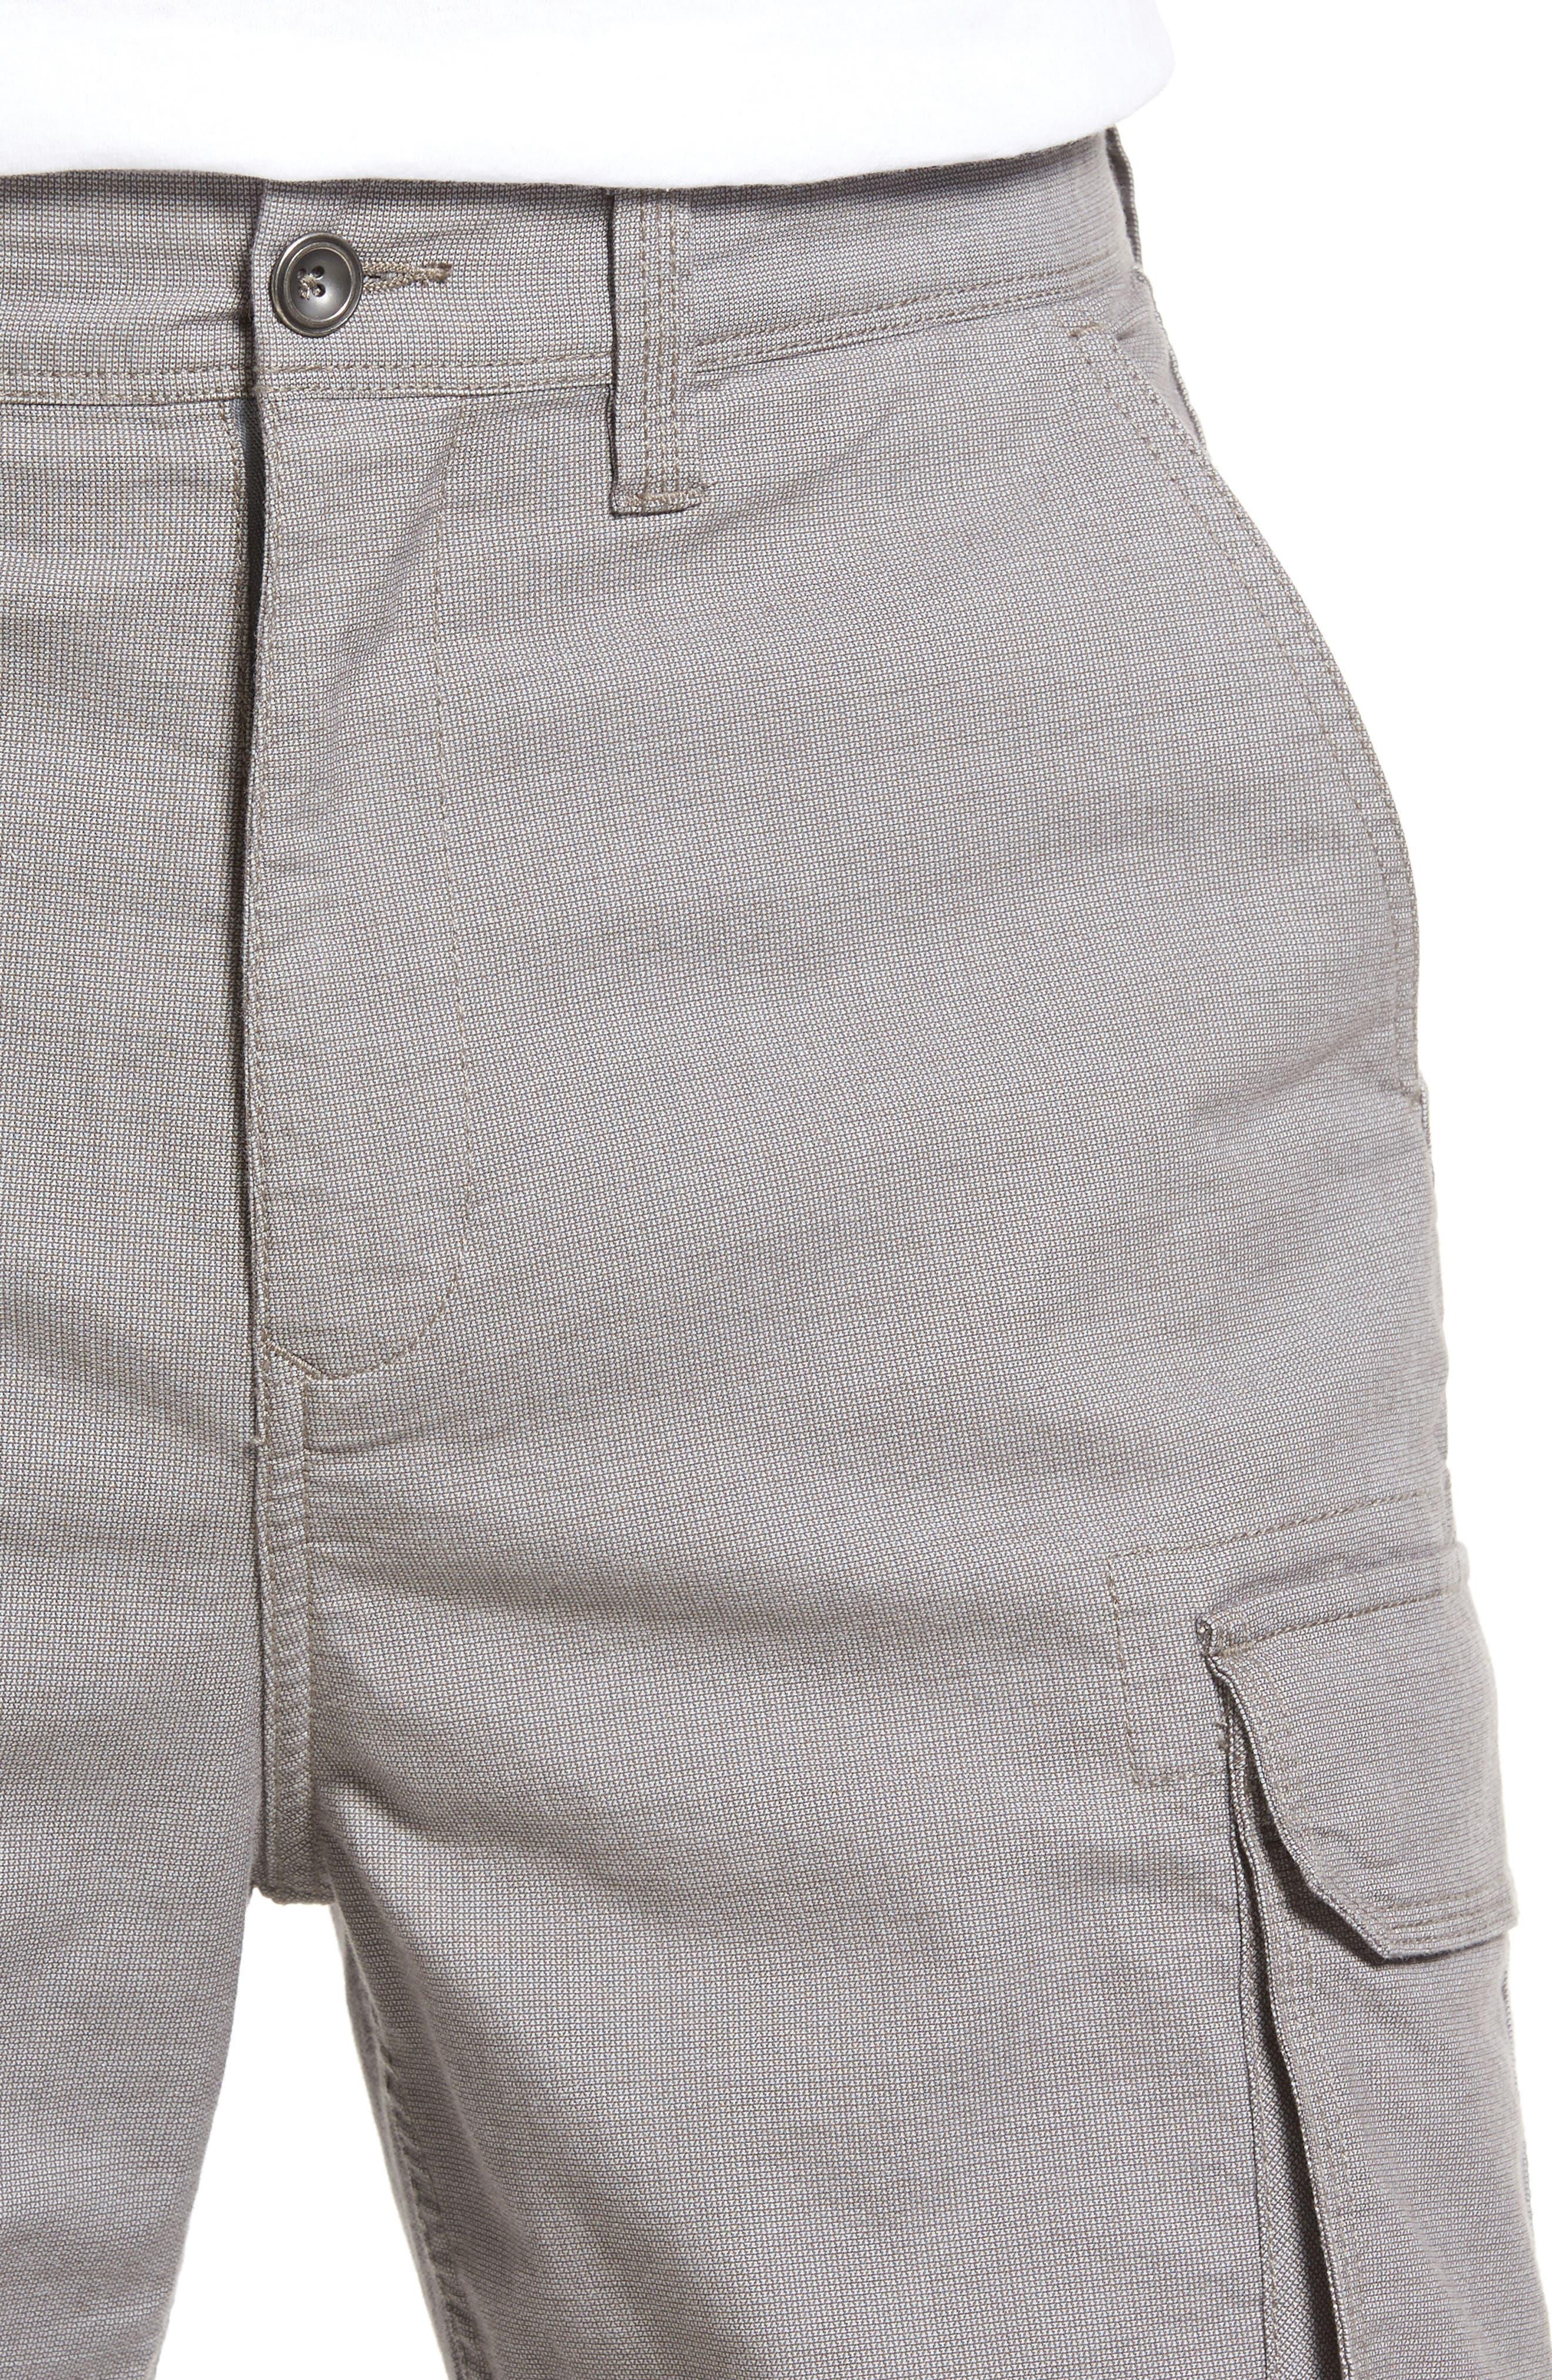 Ludstone Cargo Shorts,                             Alternate thumbnail 4, color,                             053